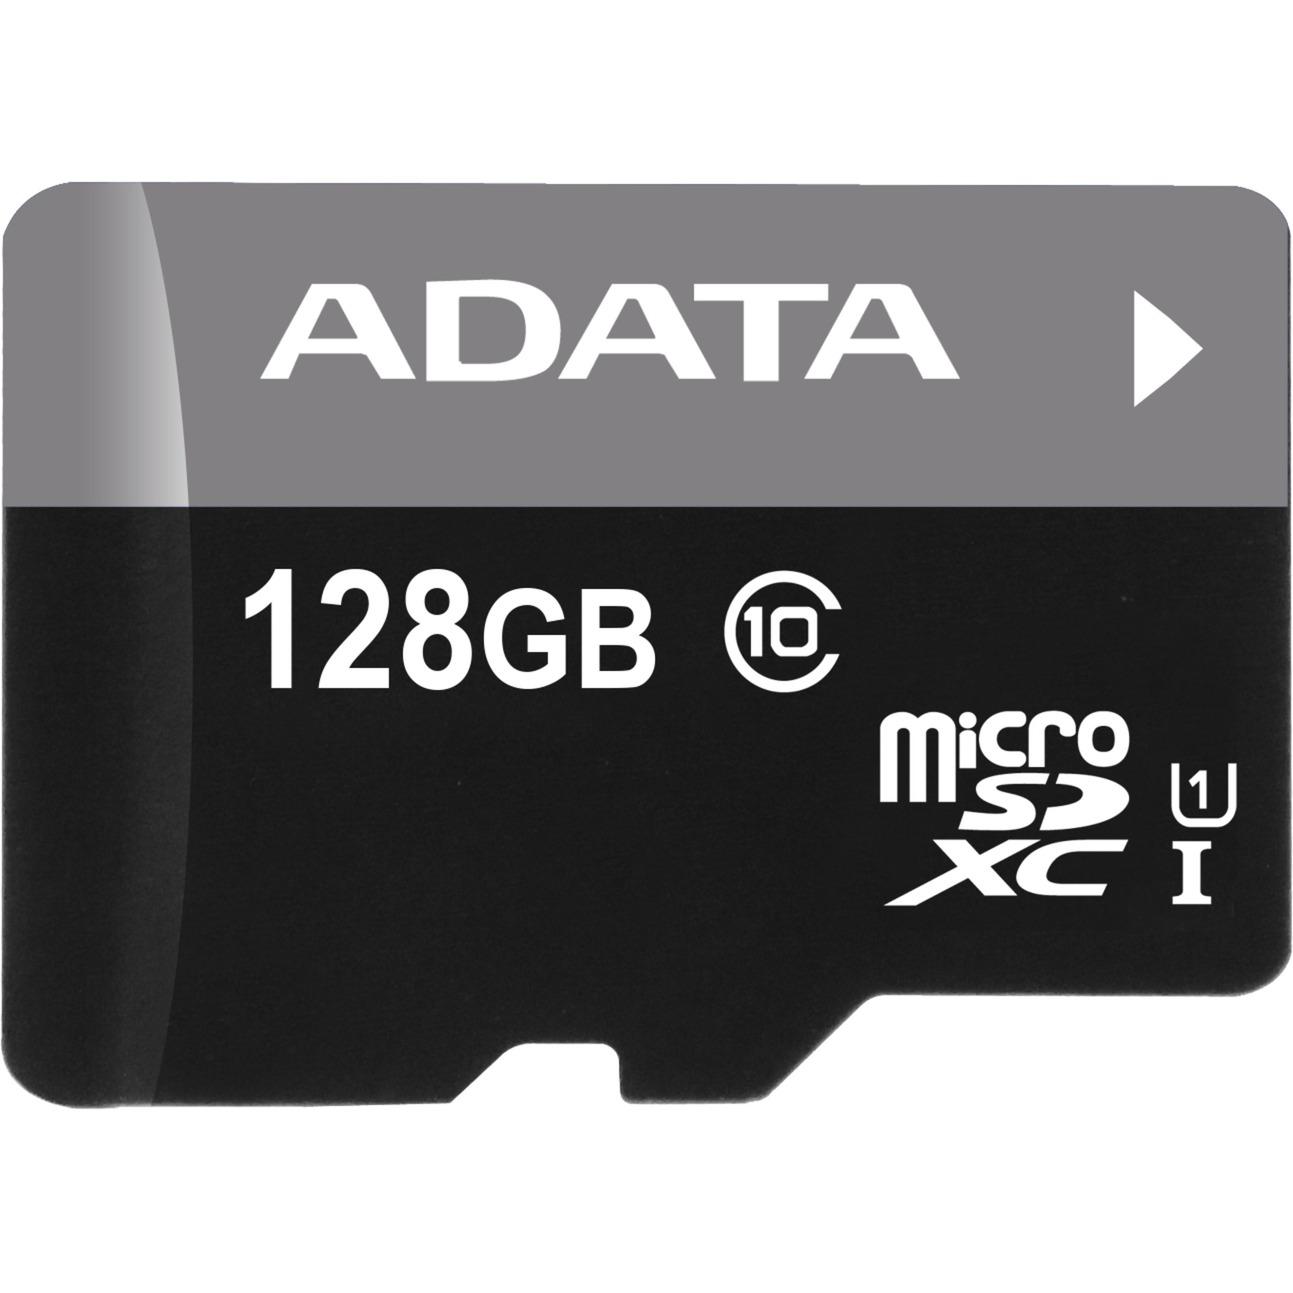 128GB microSDXC + adapter 128GB MicroSDXC UHS-I Clase 10 memoria flash, Tarjeta de memoria